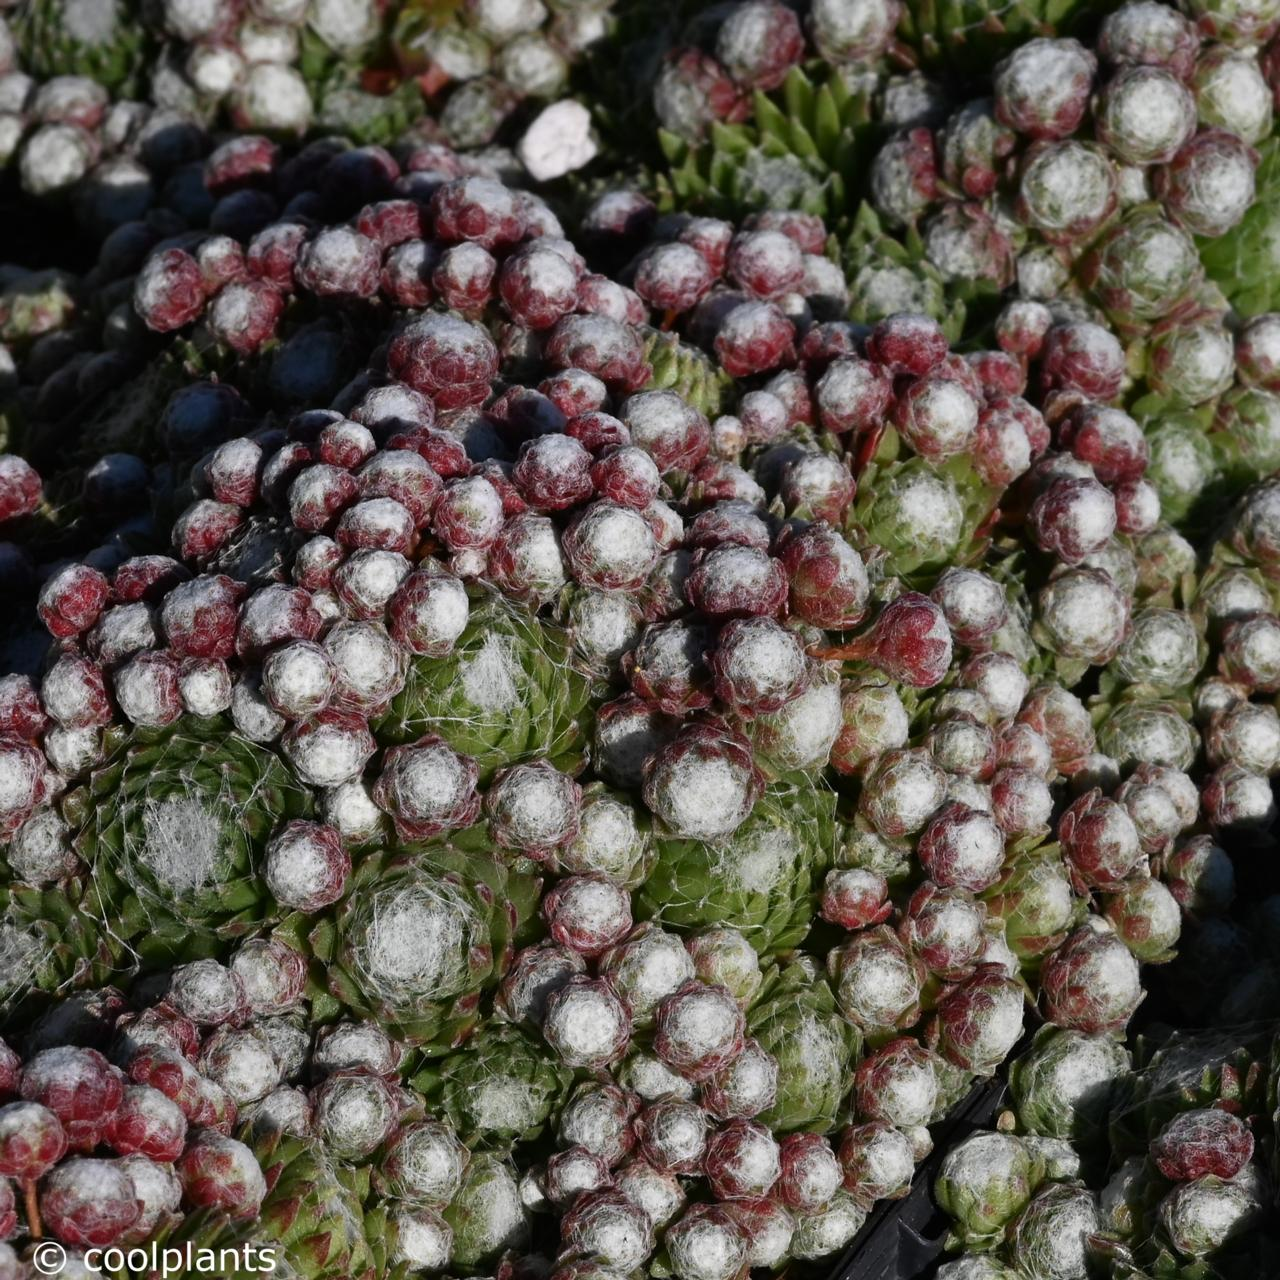 Sempervivum arach. 'Minus' plant